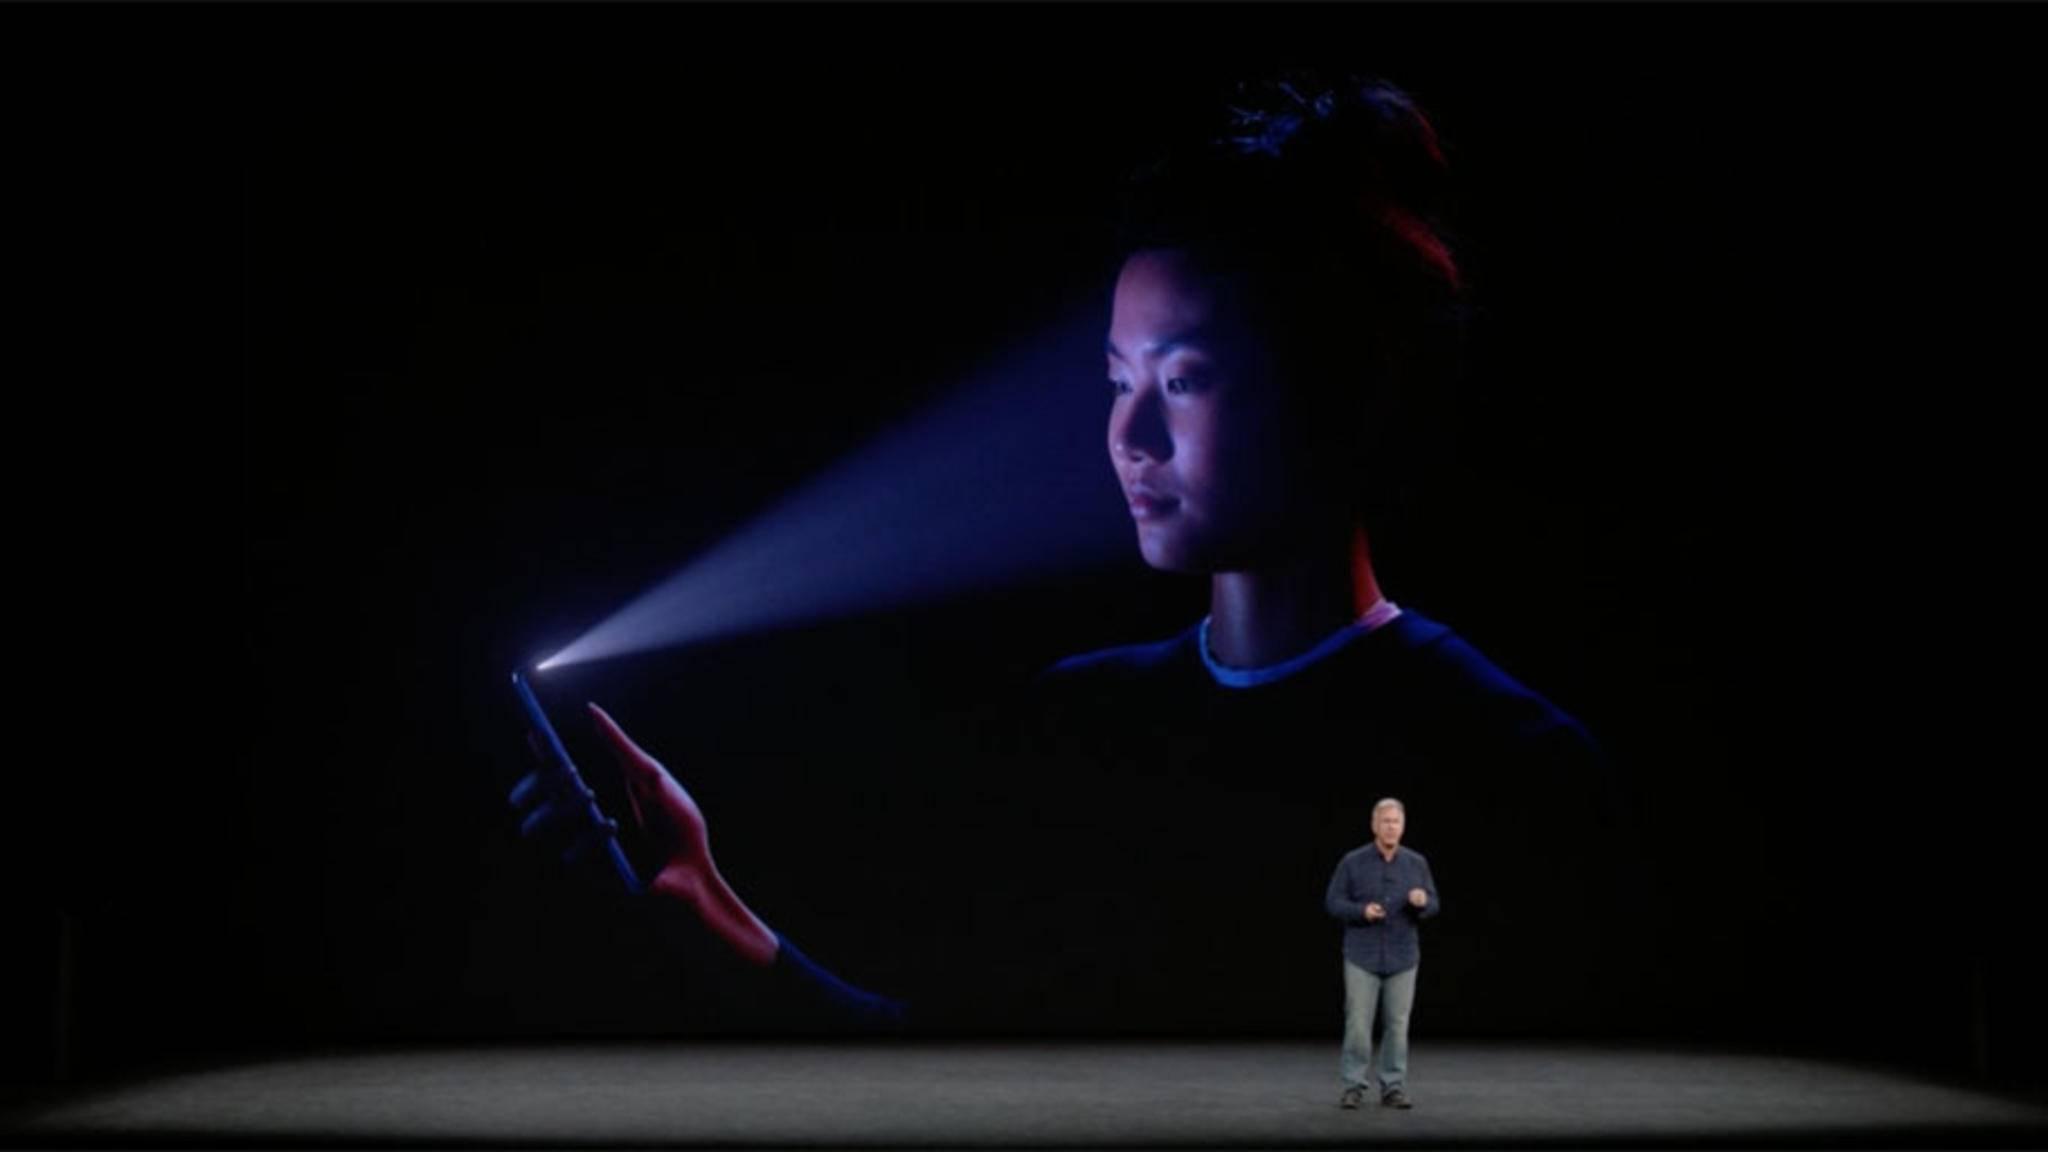 Beim Jubiläumsmodell wird Touch ID durch Face ID ersetzt.